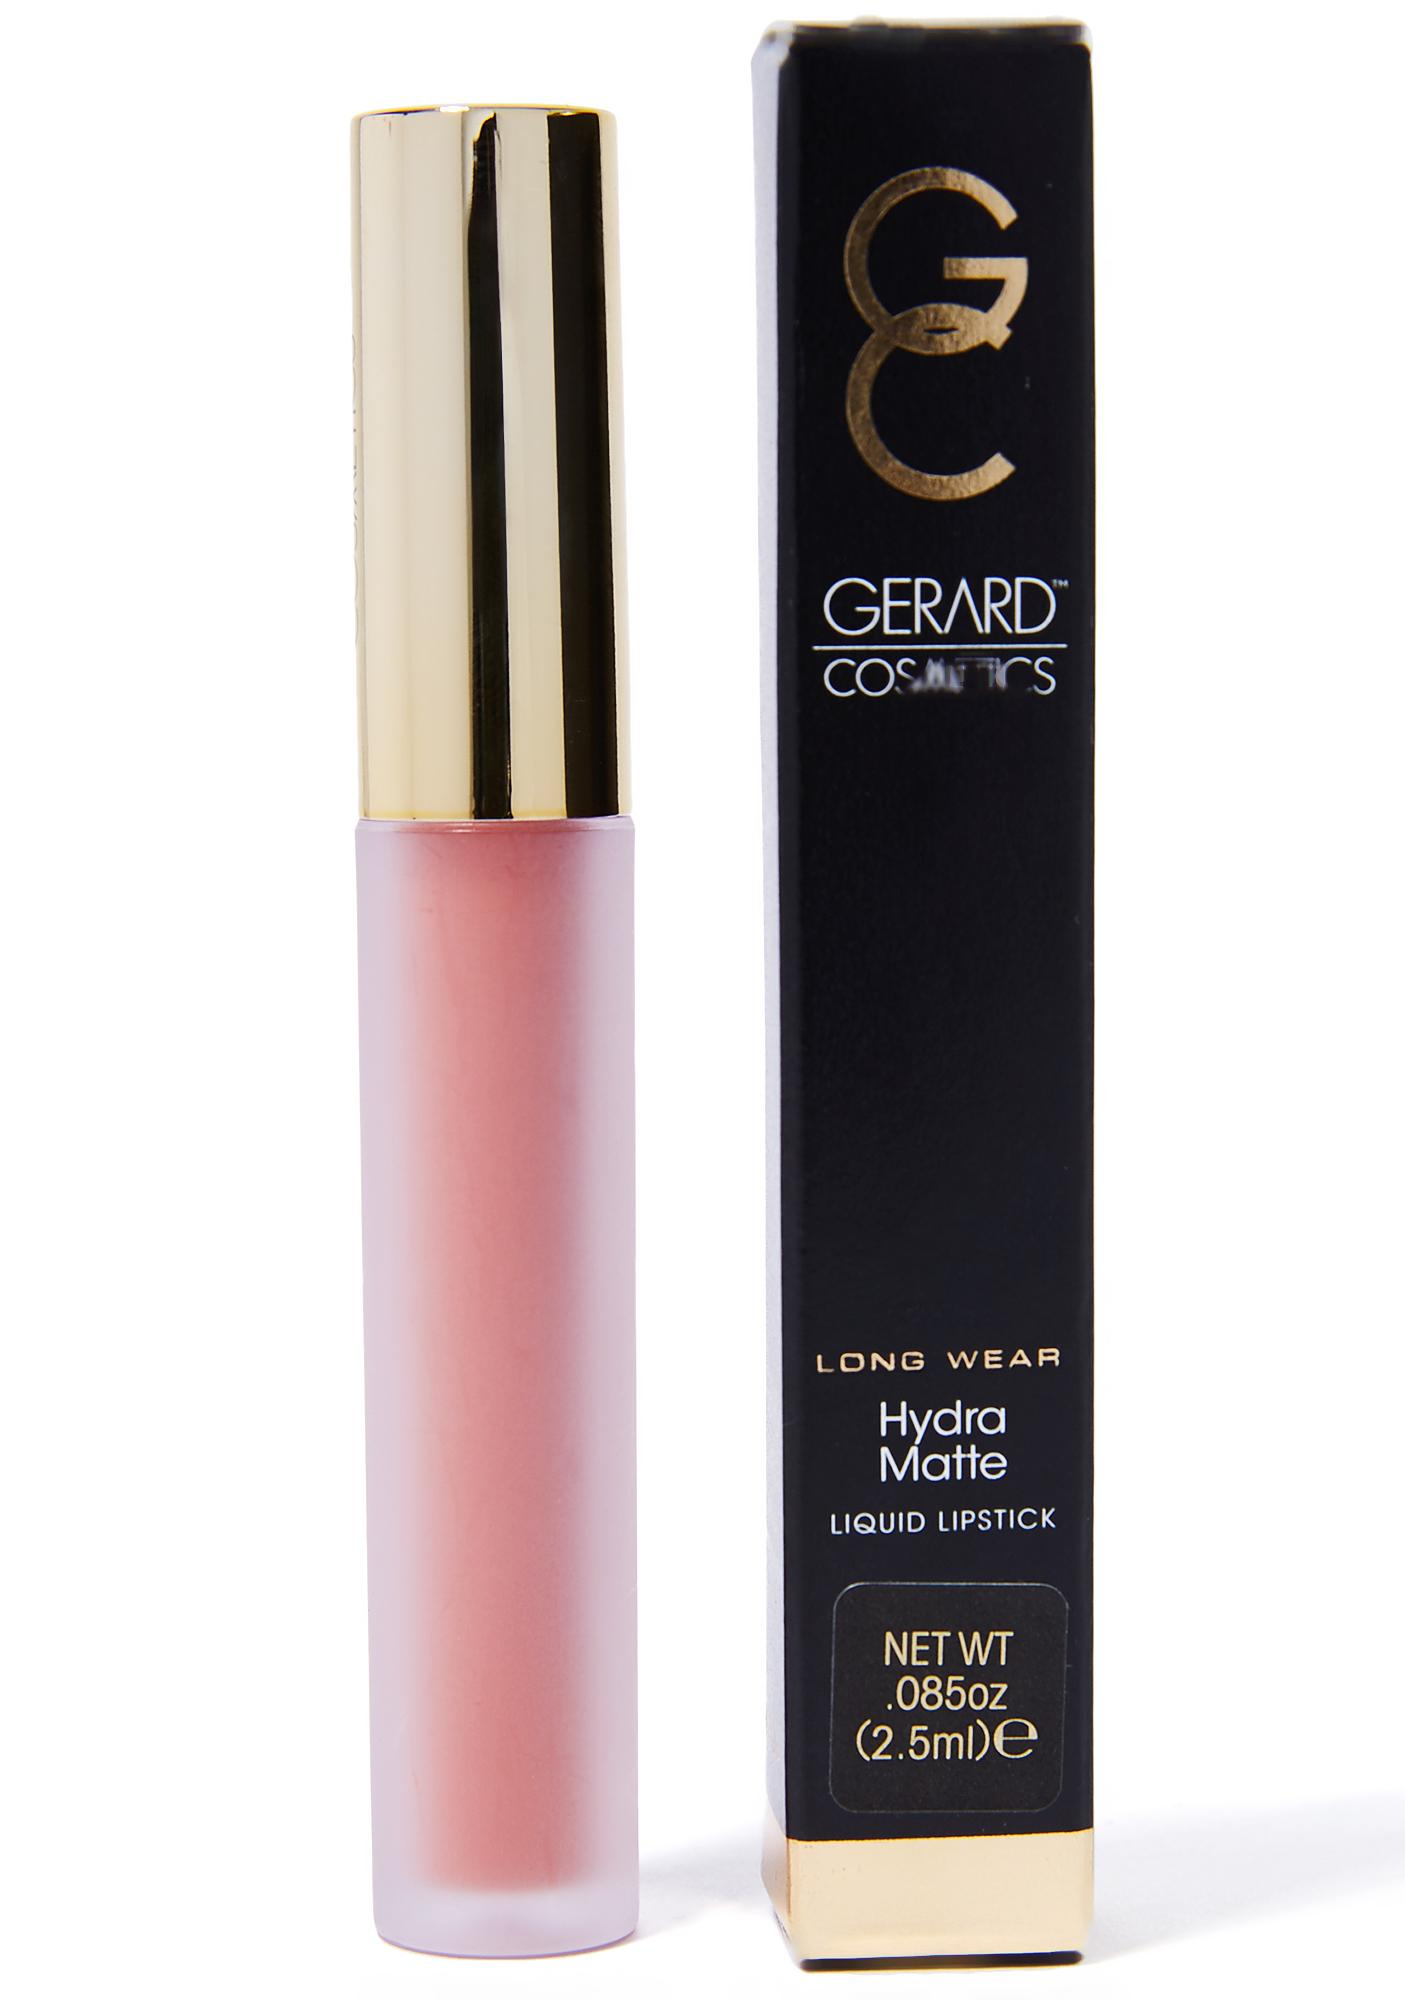 Gerard Cosmetics Madison Avenue Hydra-Matte Liquid Lipstick